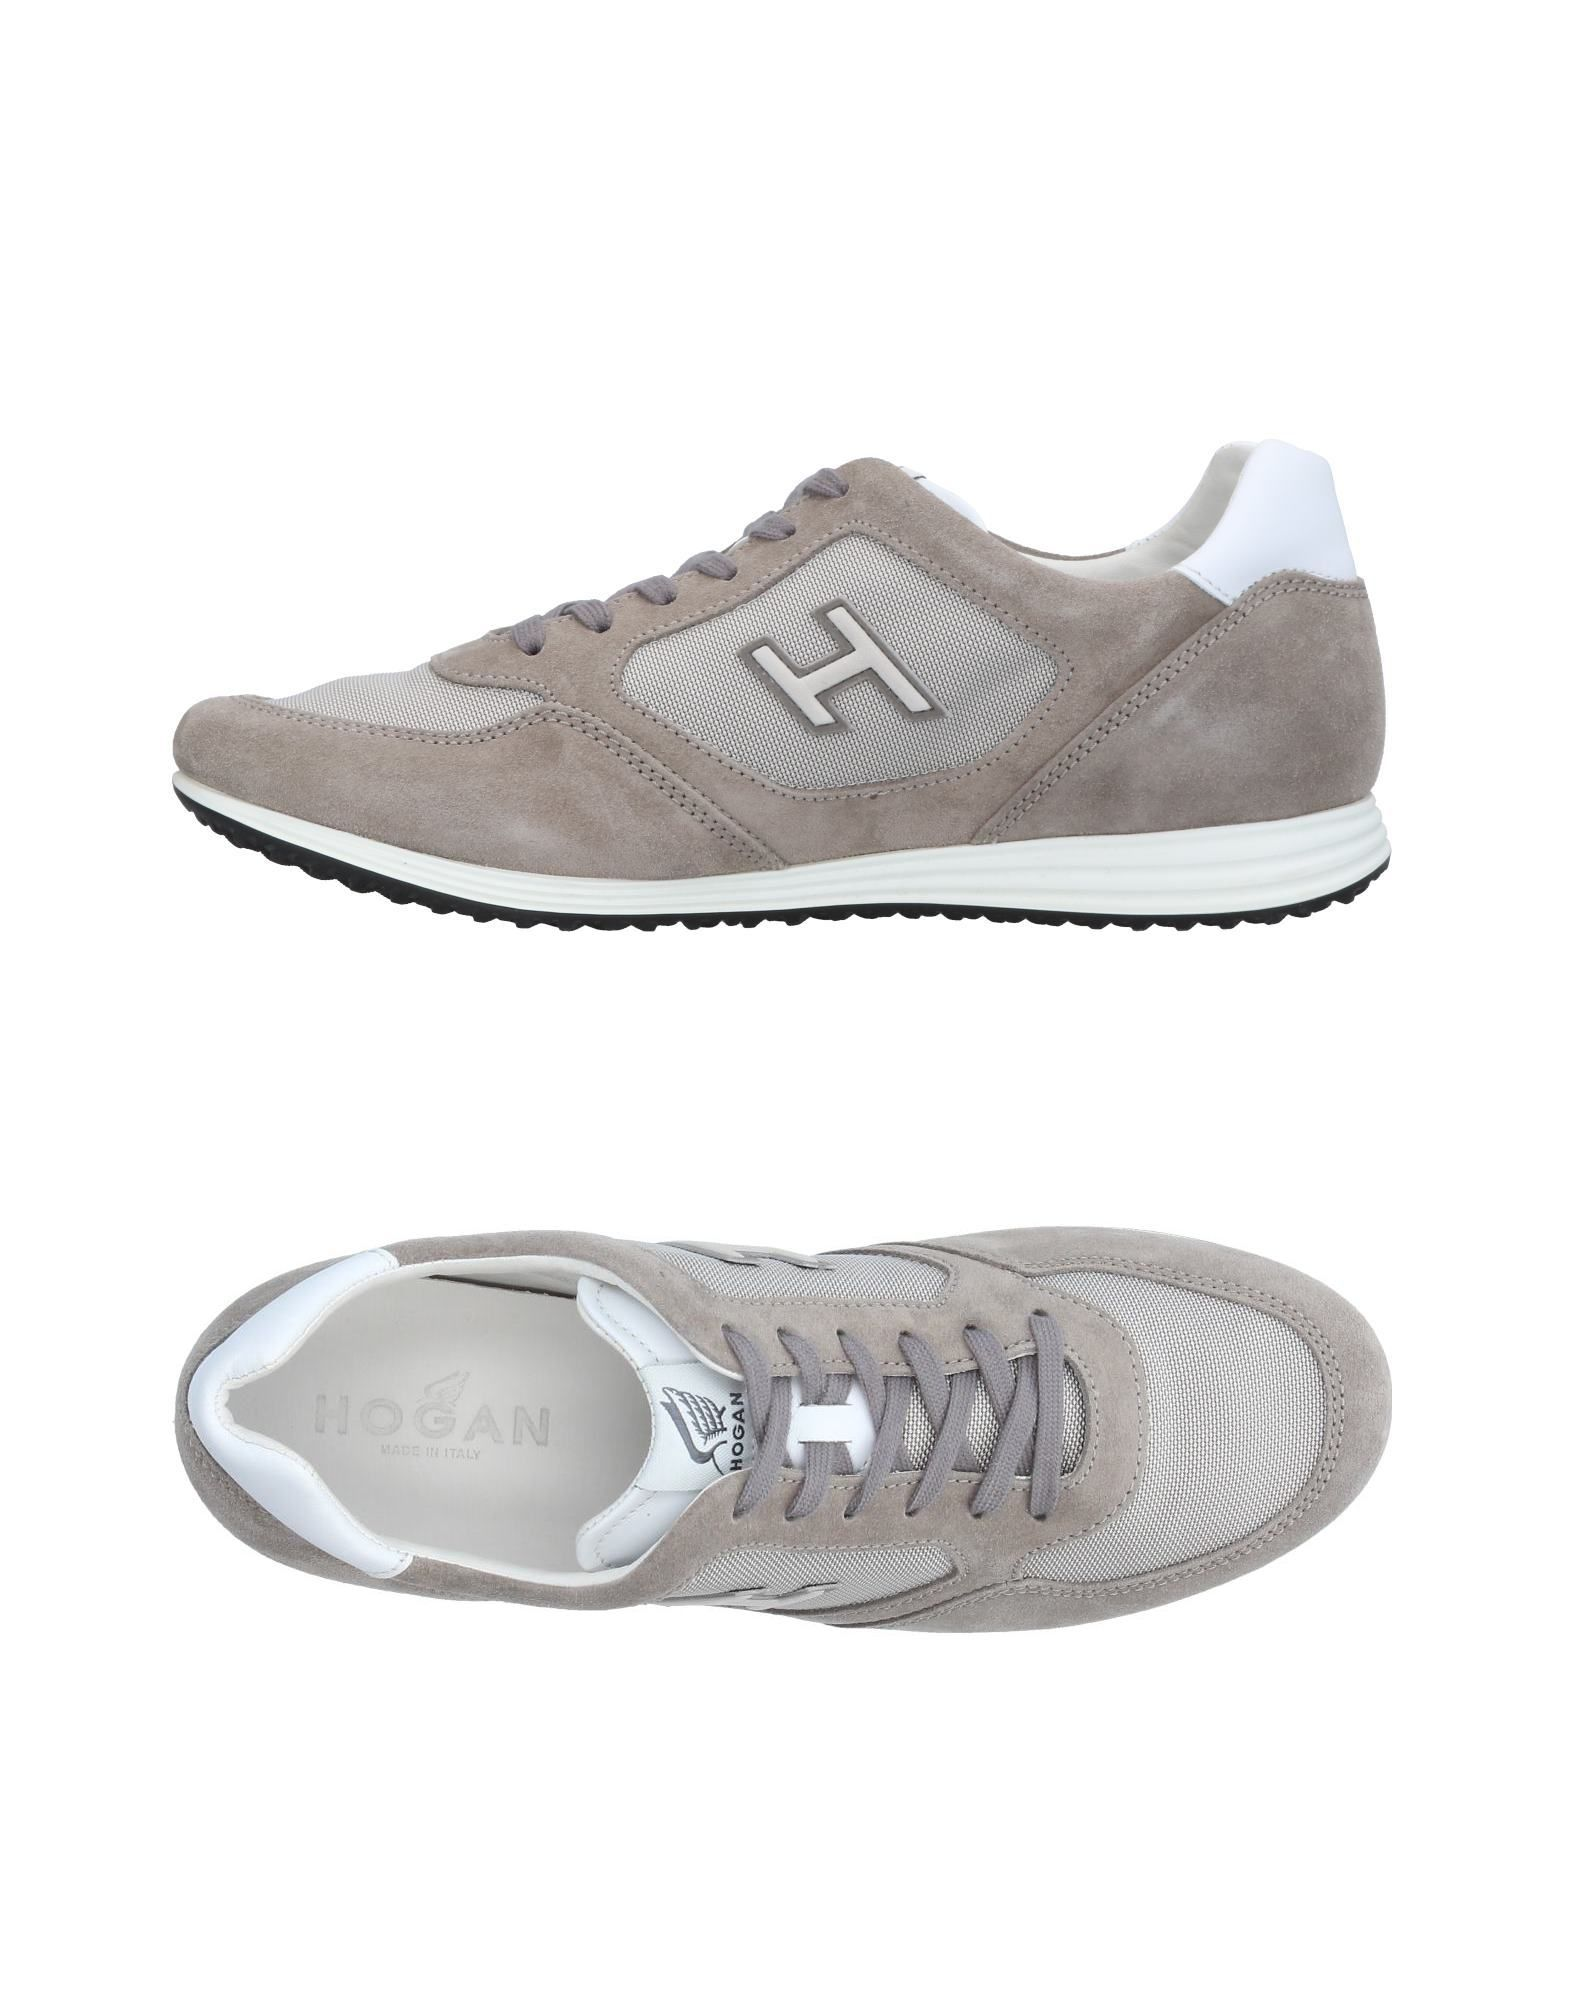 Hogan Sneakers Herren  11398204FG Gute Qualität beliebte Schuhe